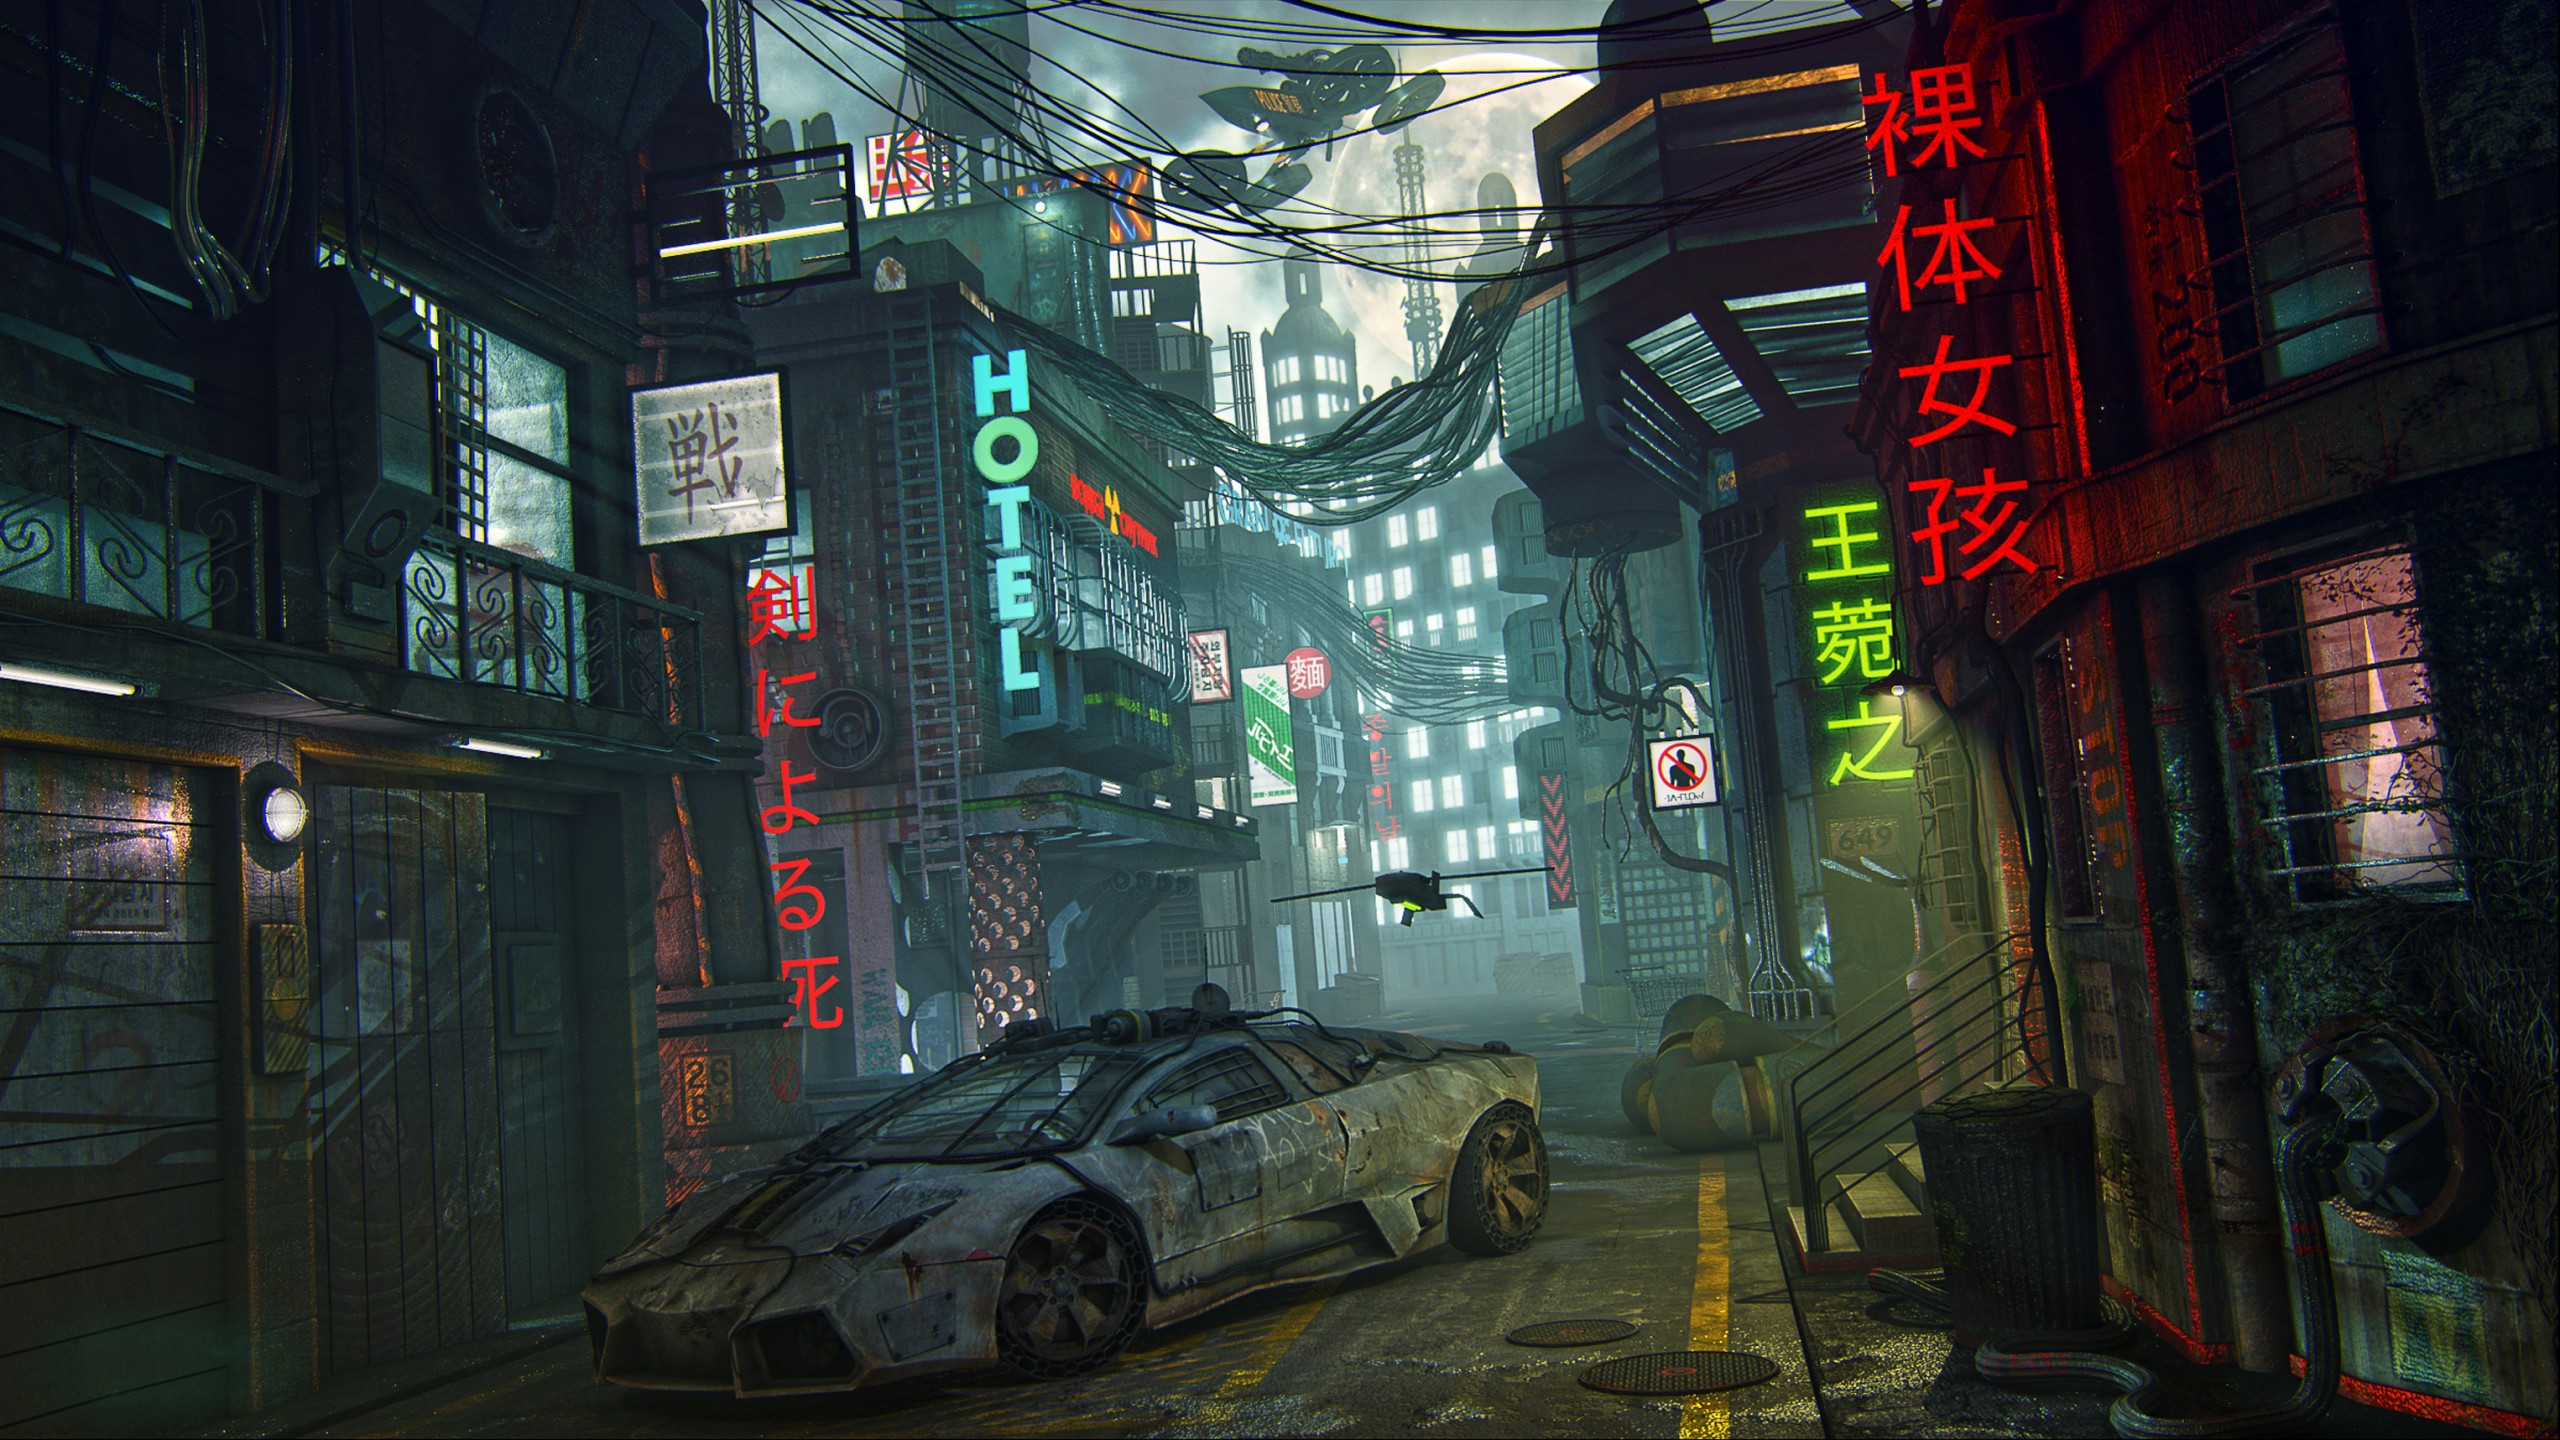 Wallpaper Futuristic Cyberpunk Future World 4k Art 20523